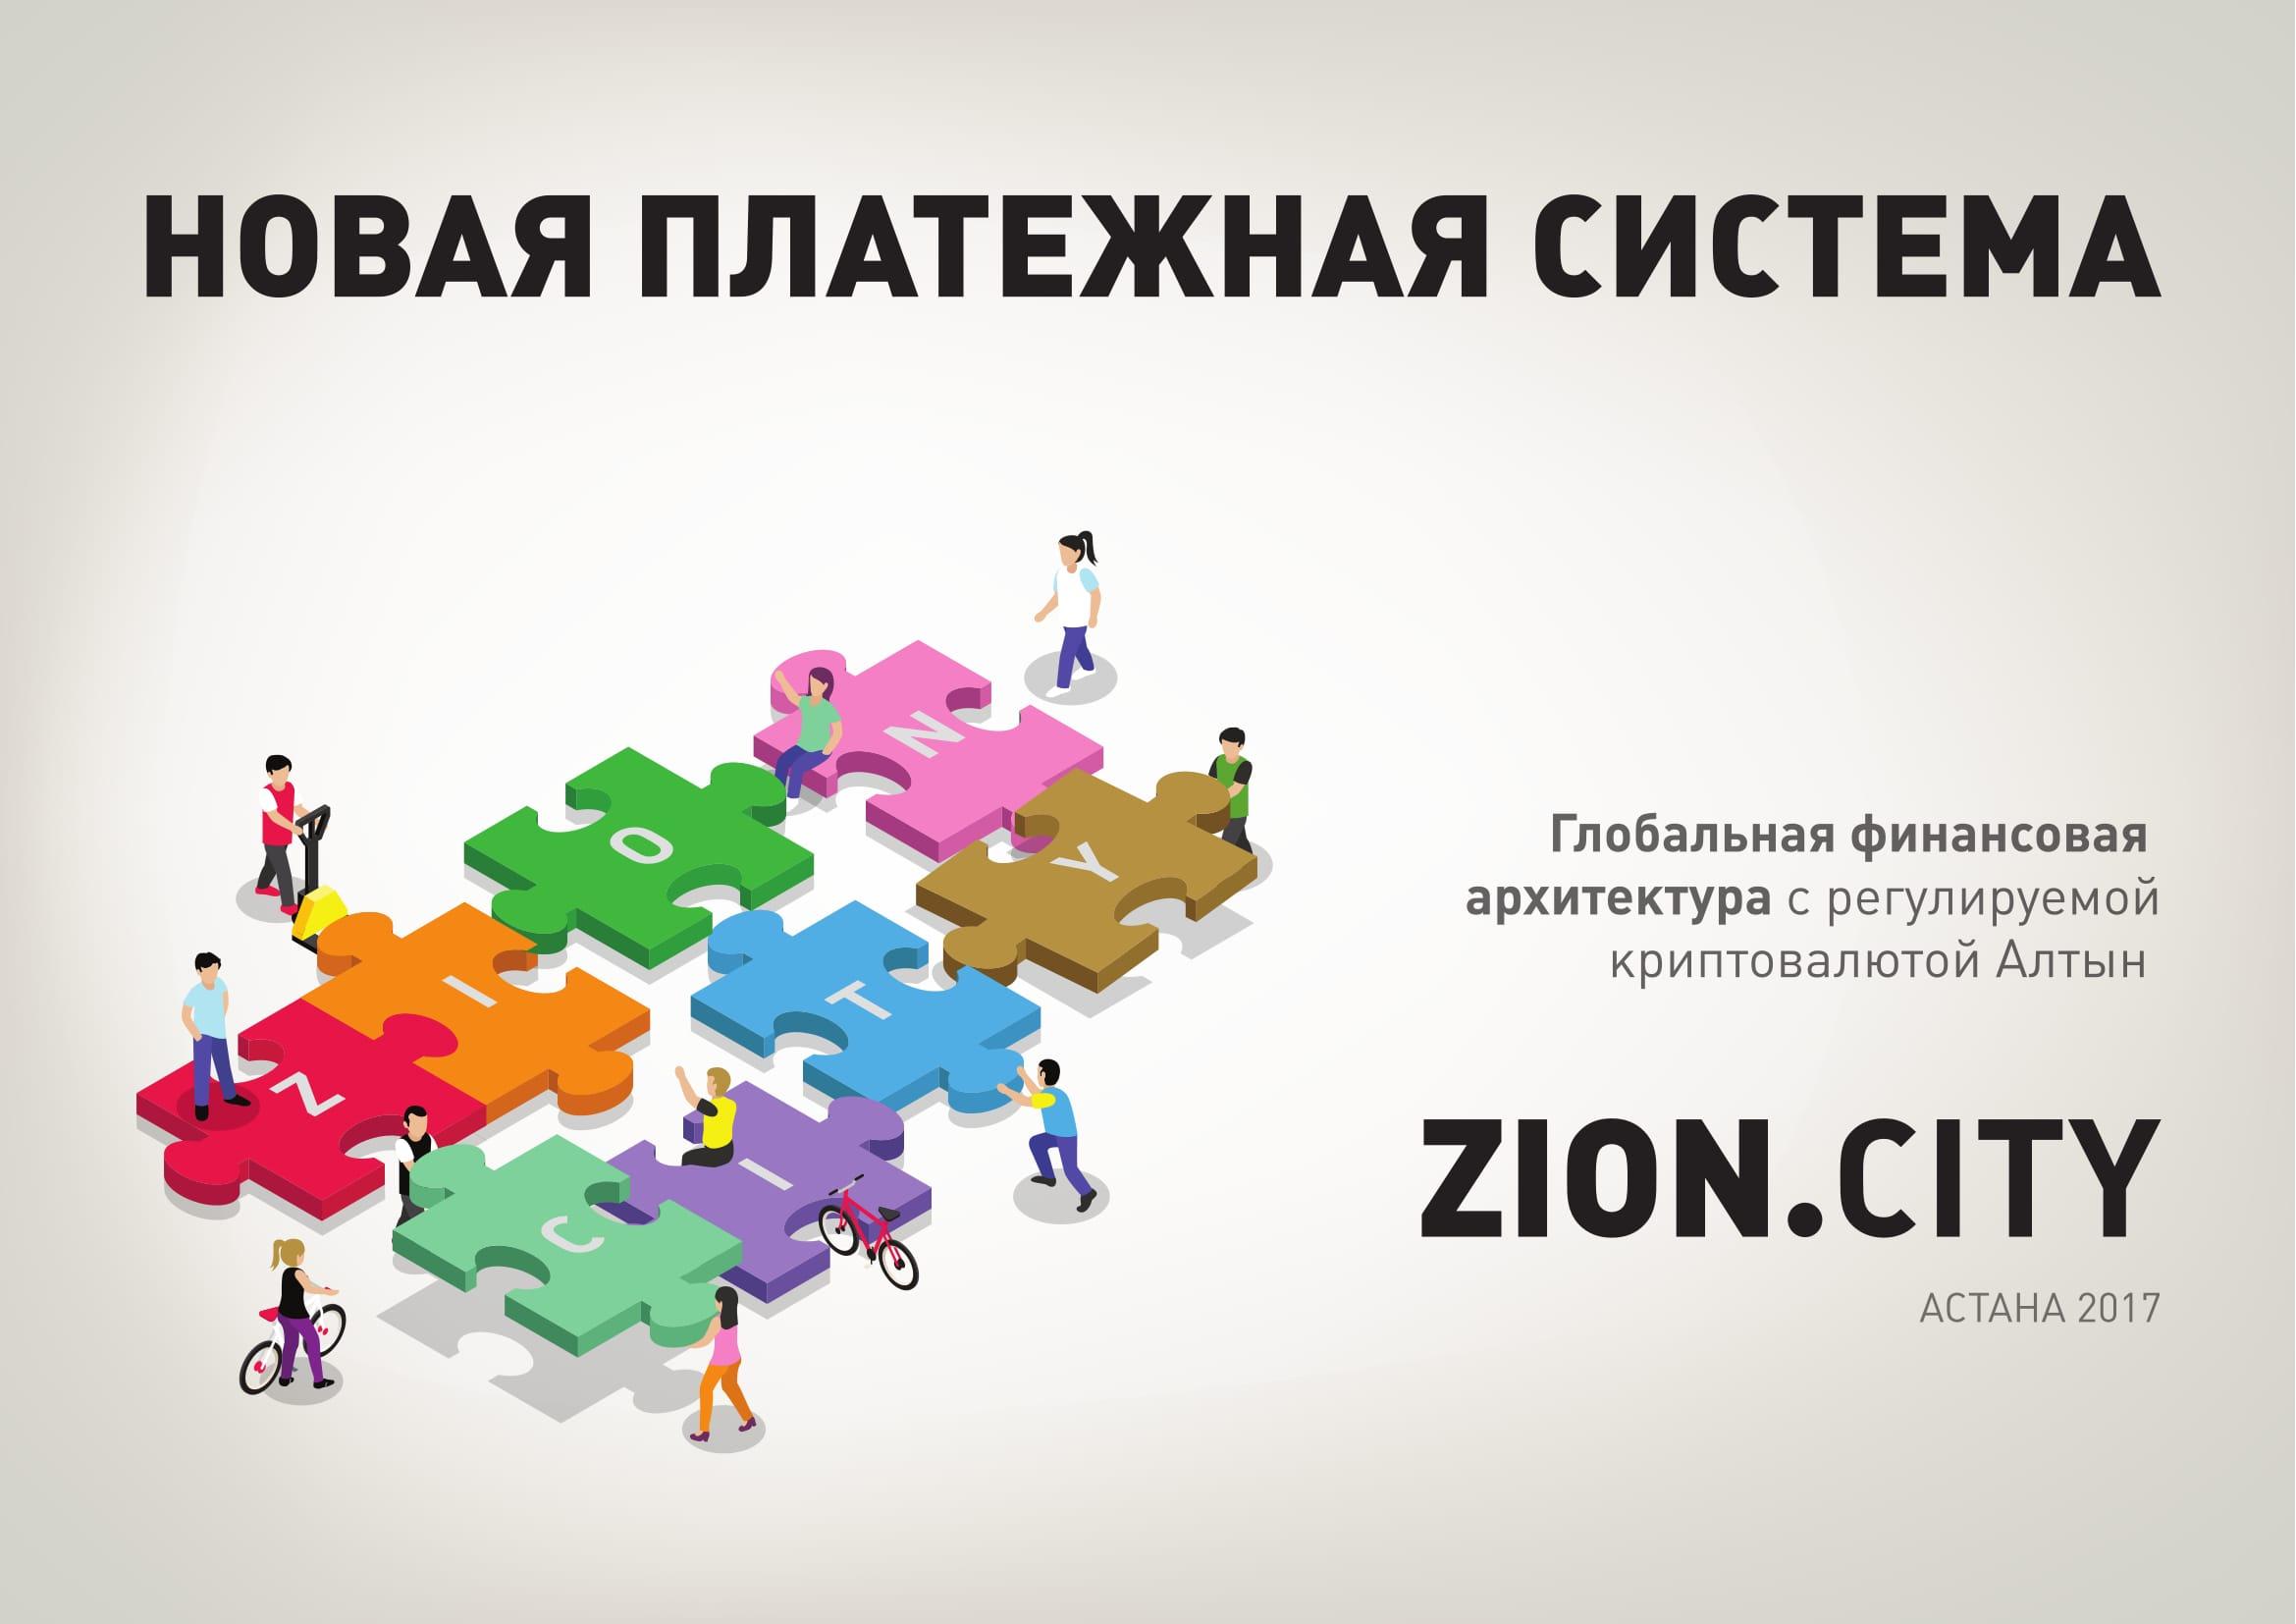 Zion.city